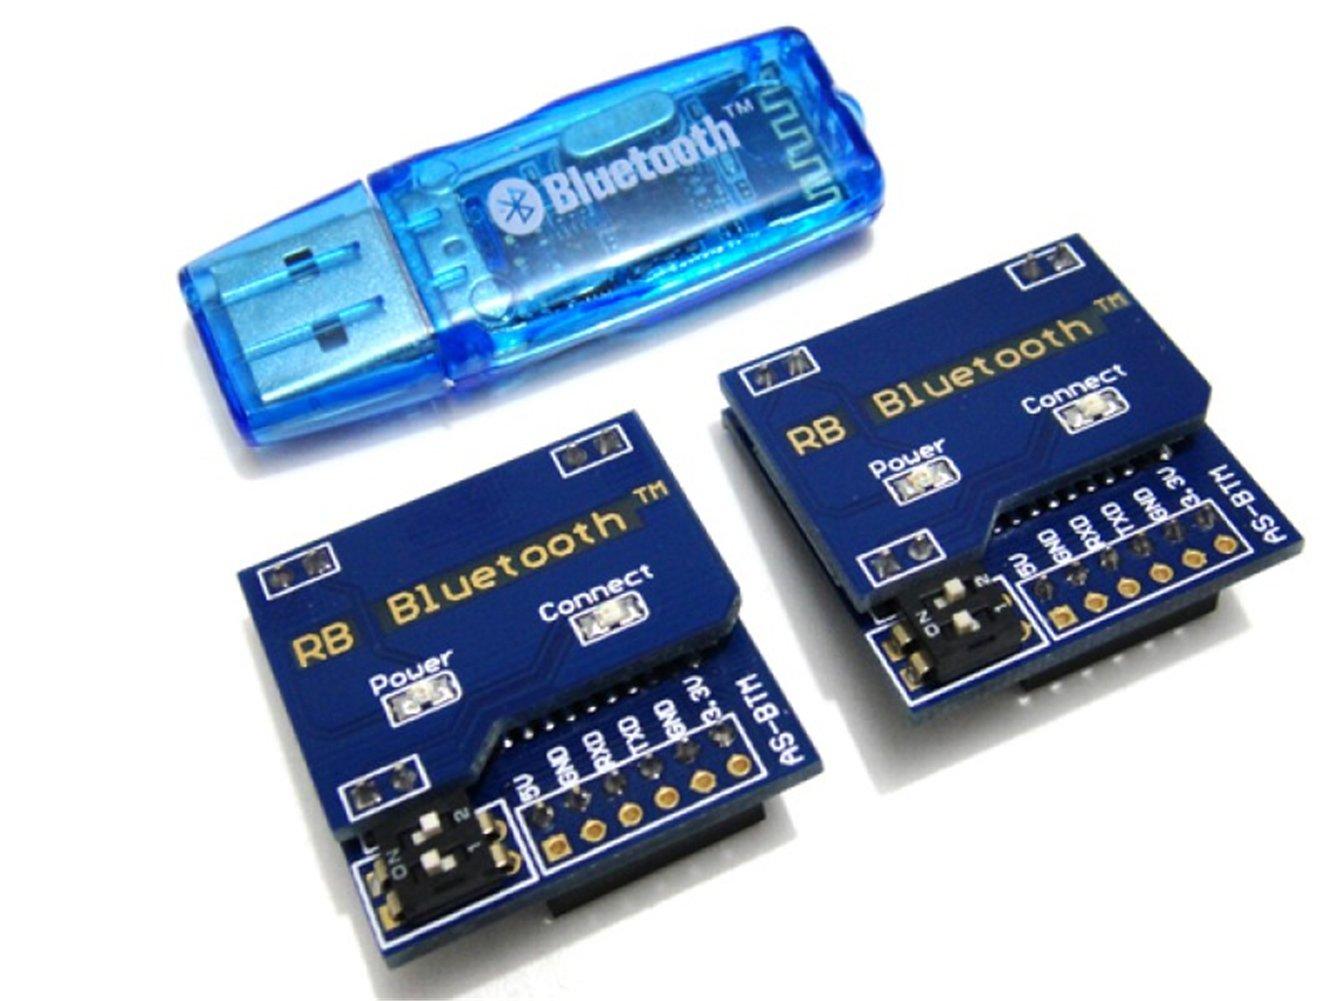 RB Bluetooth Transceiver Kit by ALSR